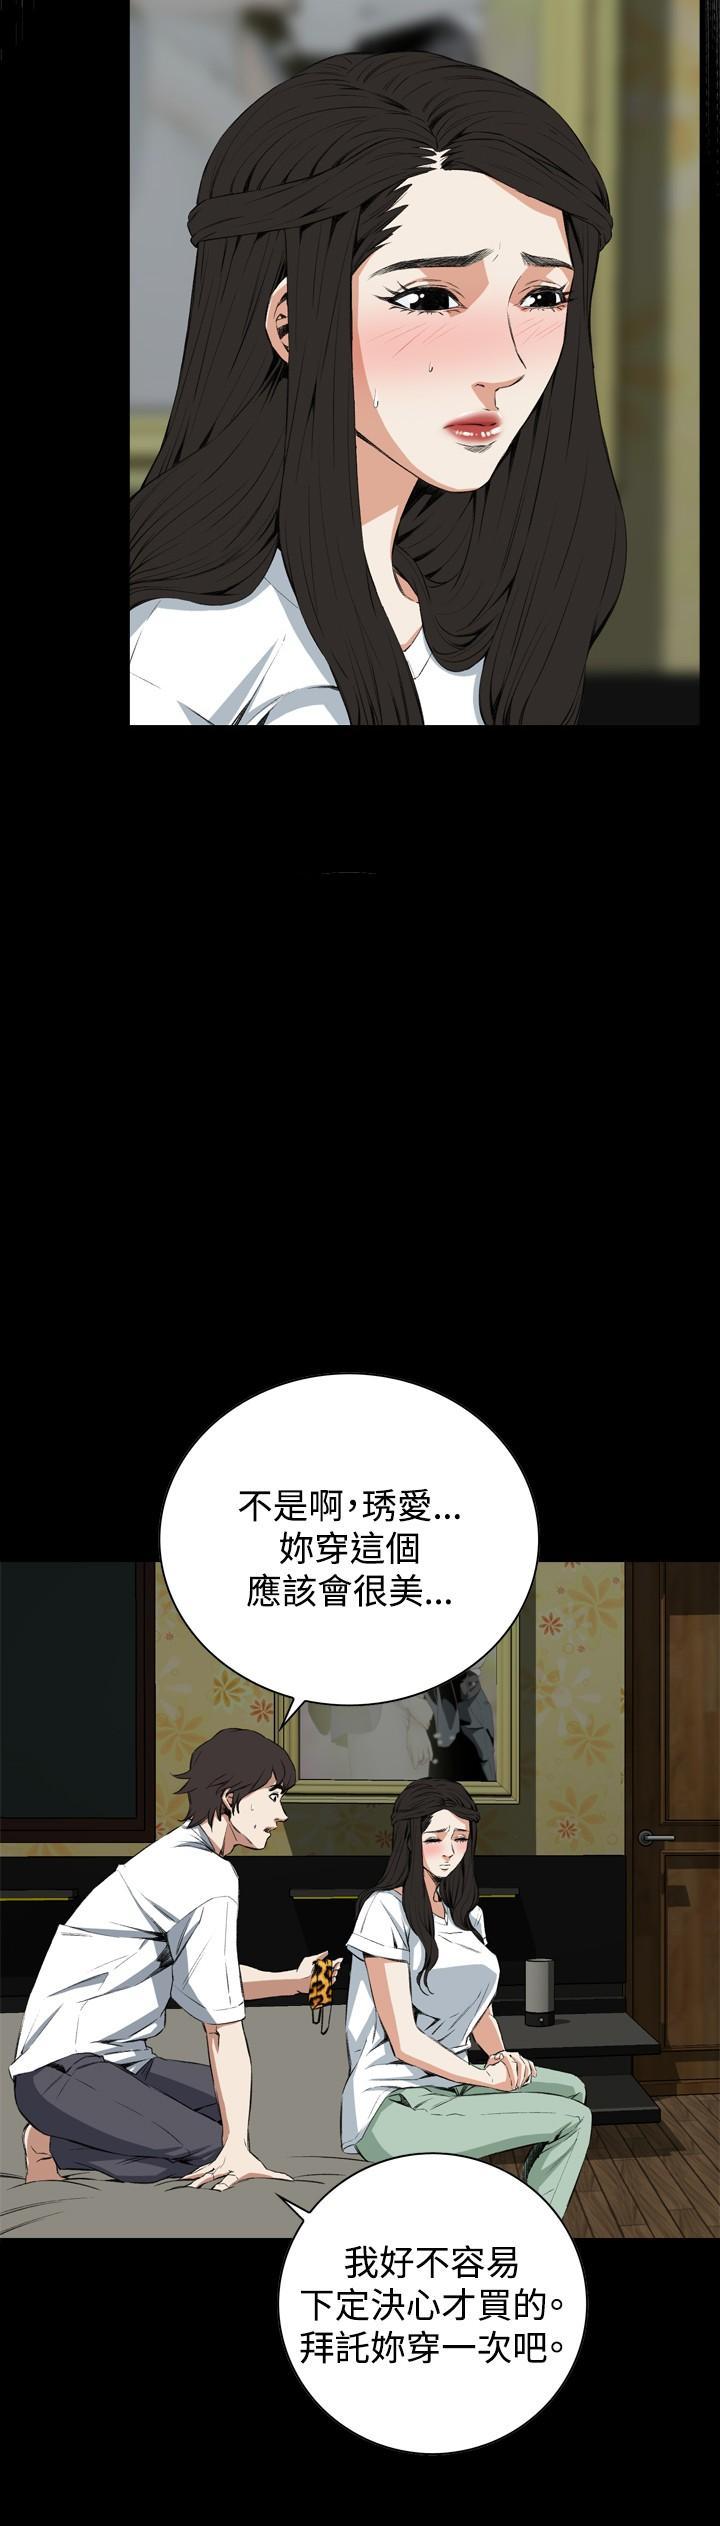 Take a Peek 偷窥 Ch.39~60 [Chinese]中文 392